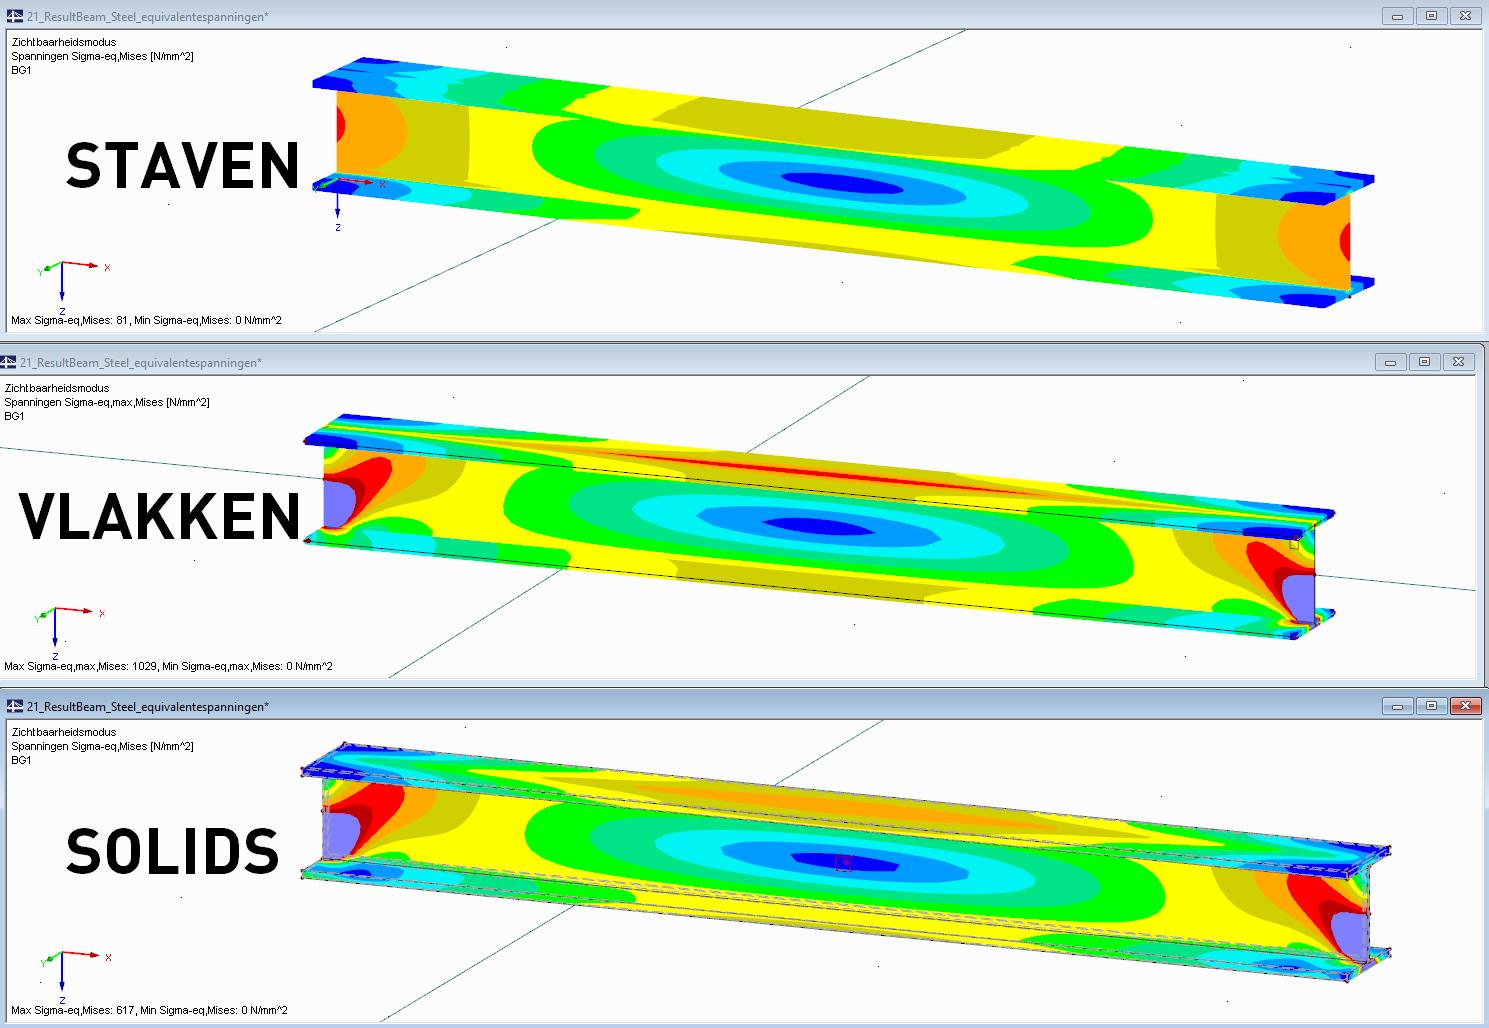 Von mises equivalente spanningen in staven,vlakken en solids in rekensoftware RFEM